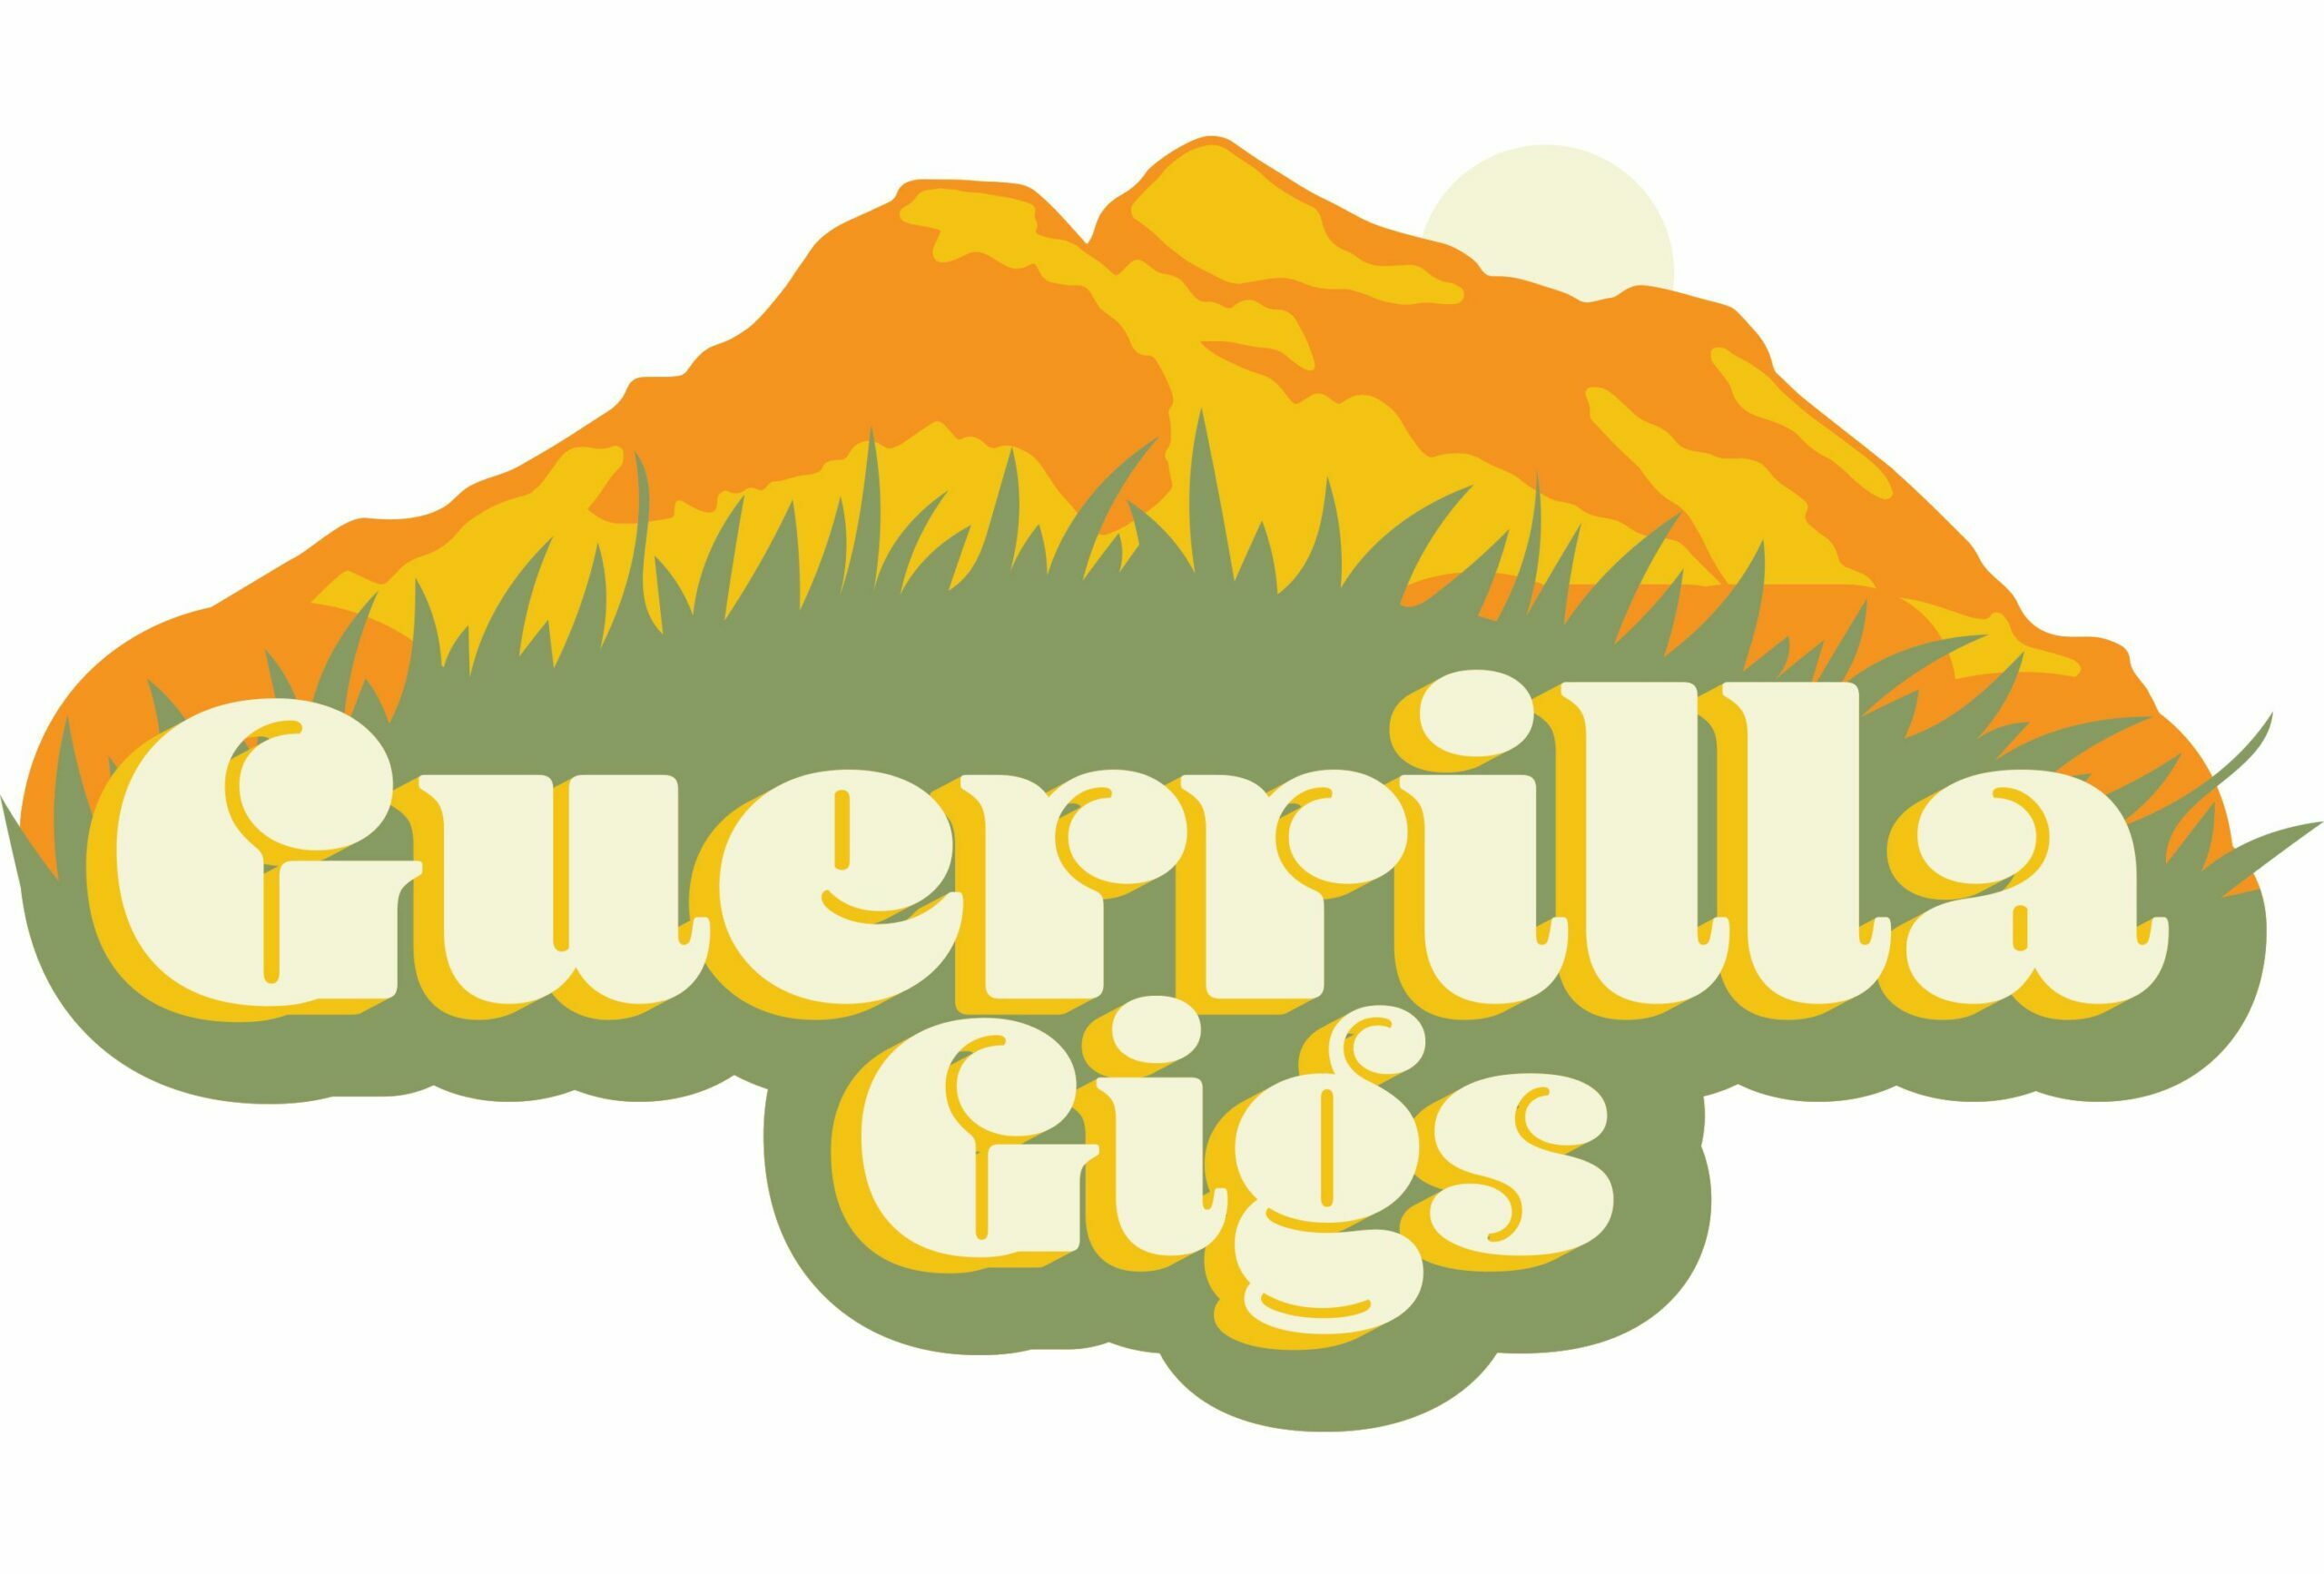 guerrila gigs logo 5 scaled e1614036567657